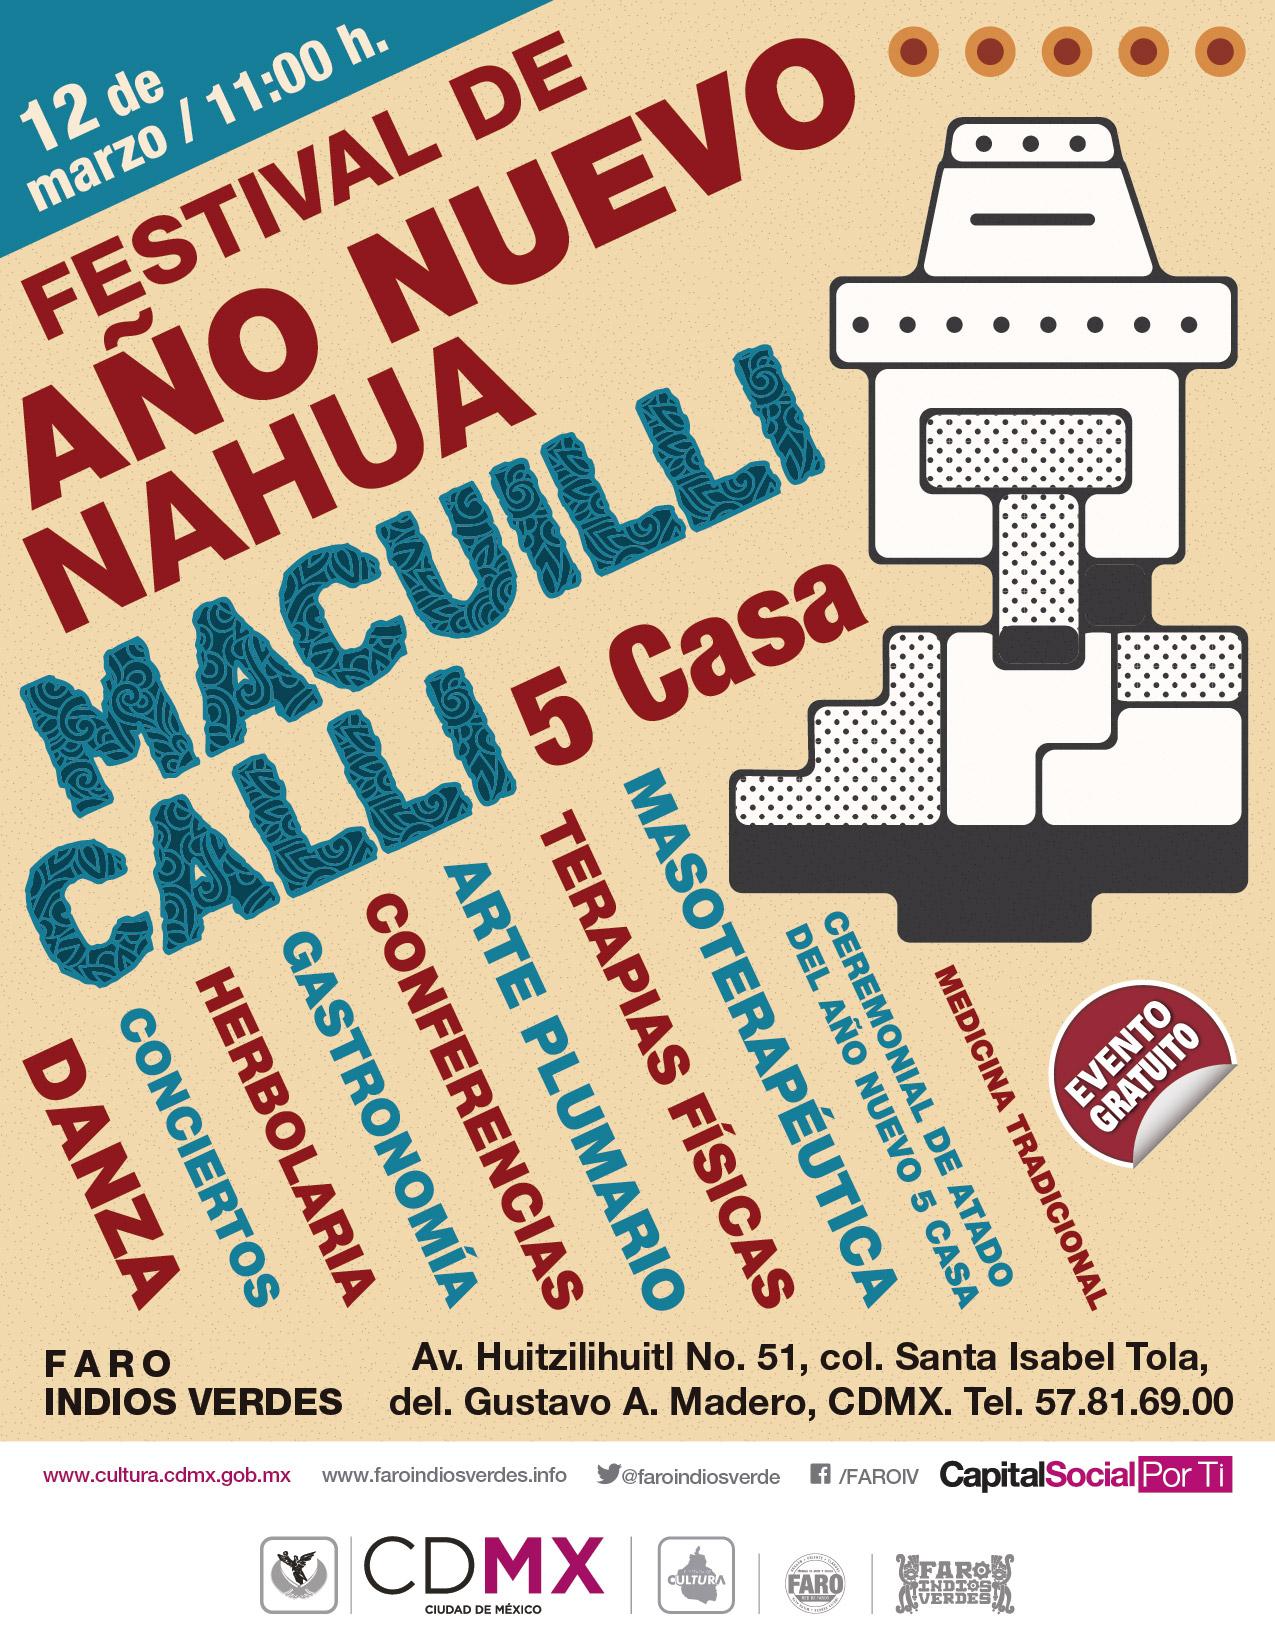 FESTIVAL DE AÑO NUEVO NAHUA